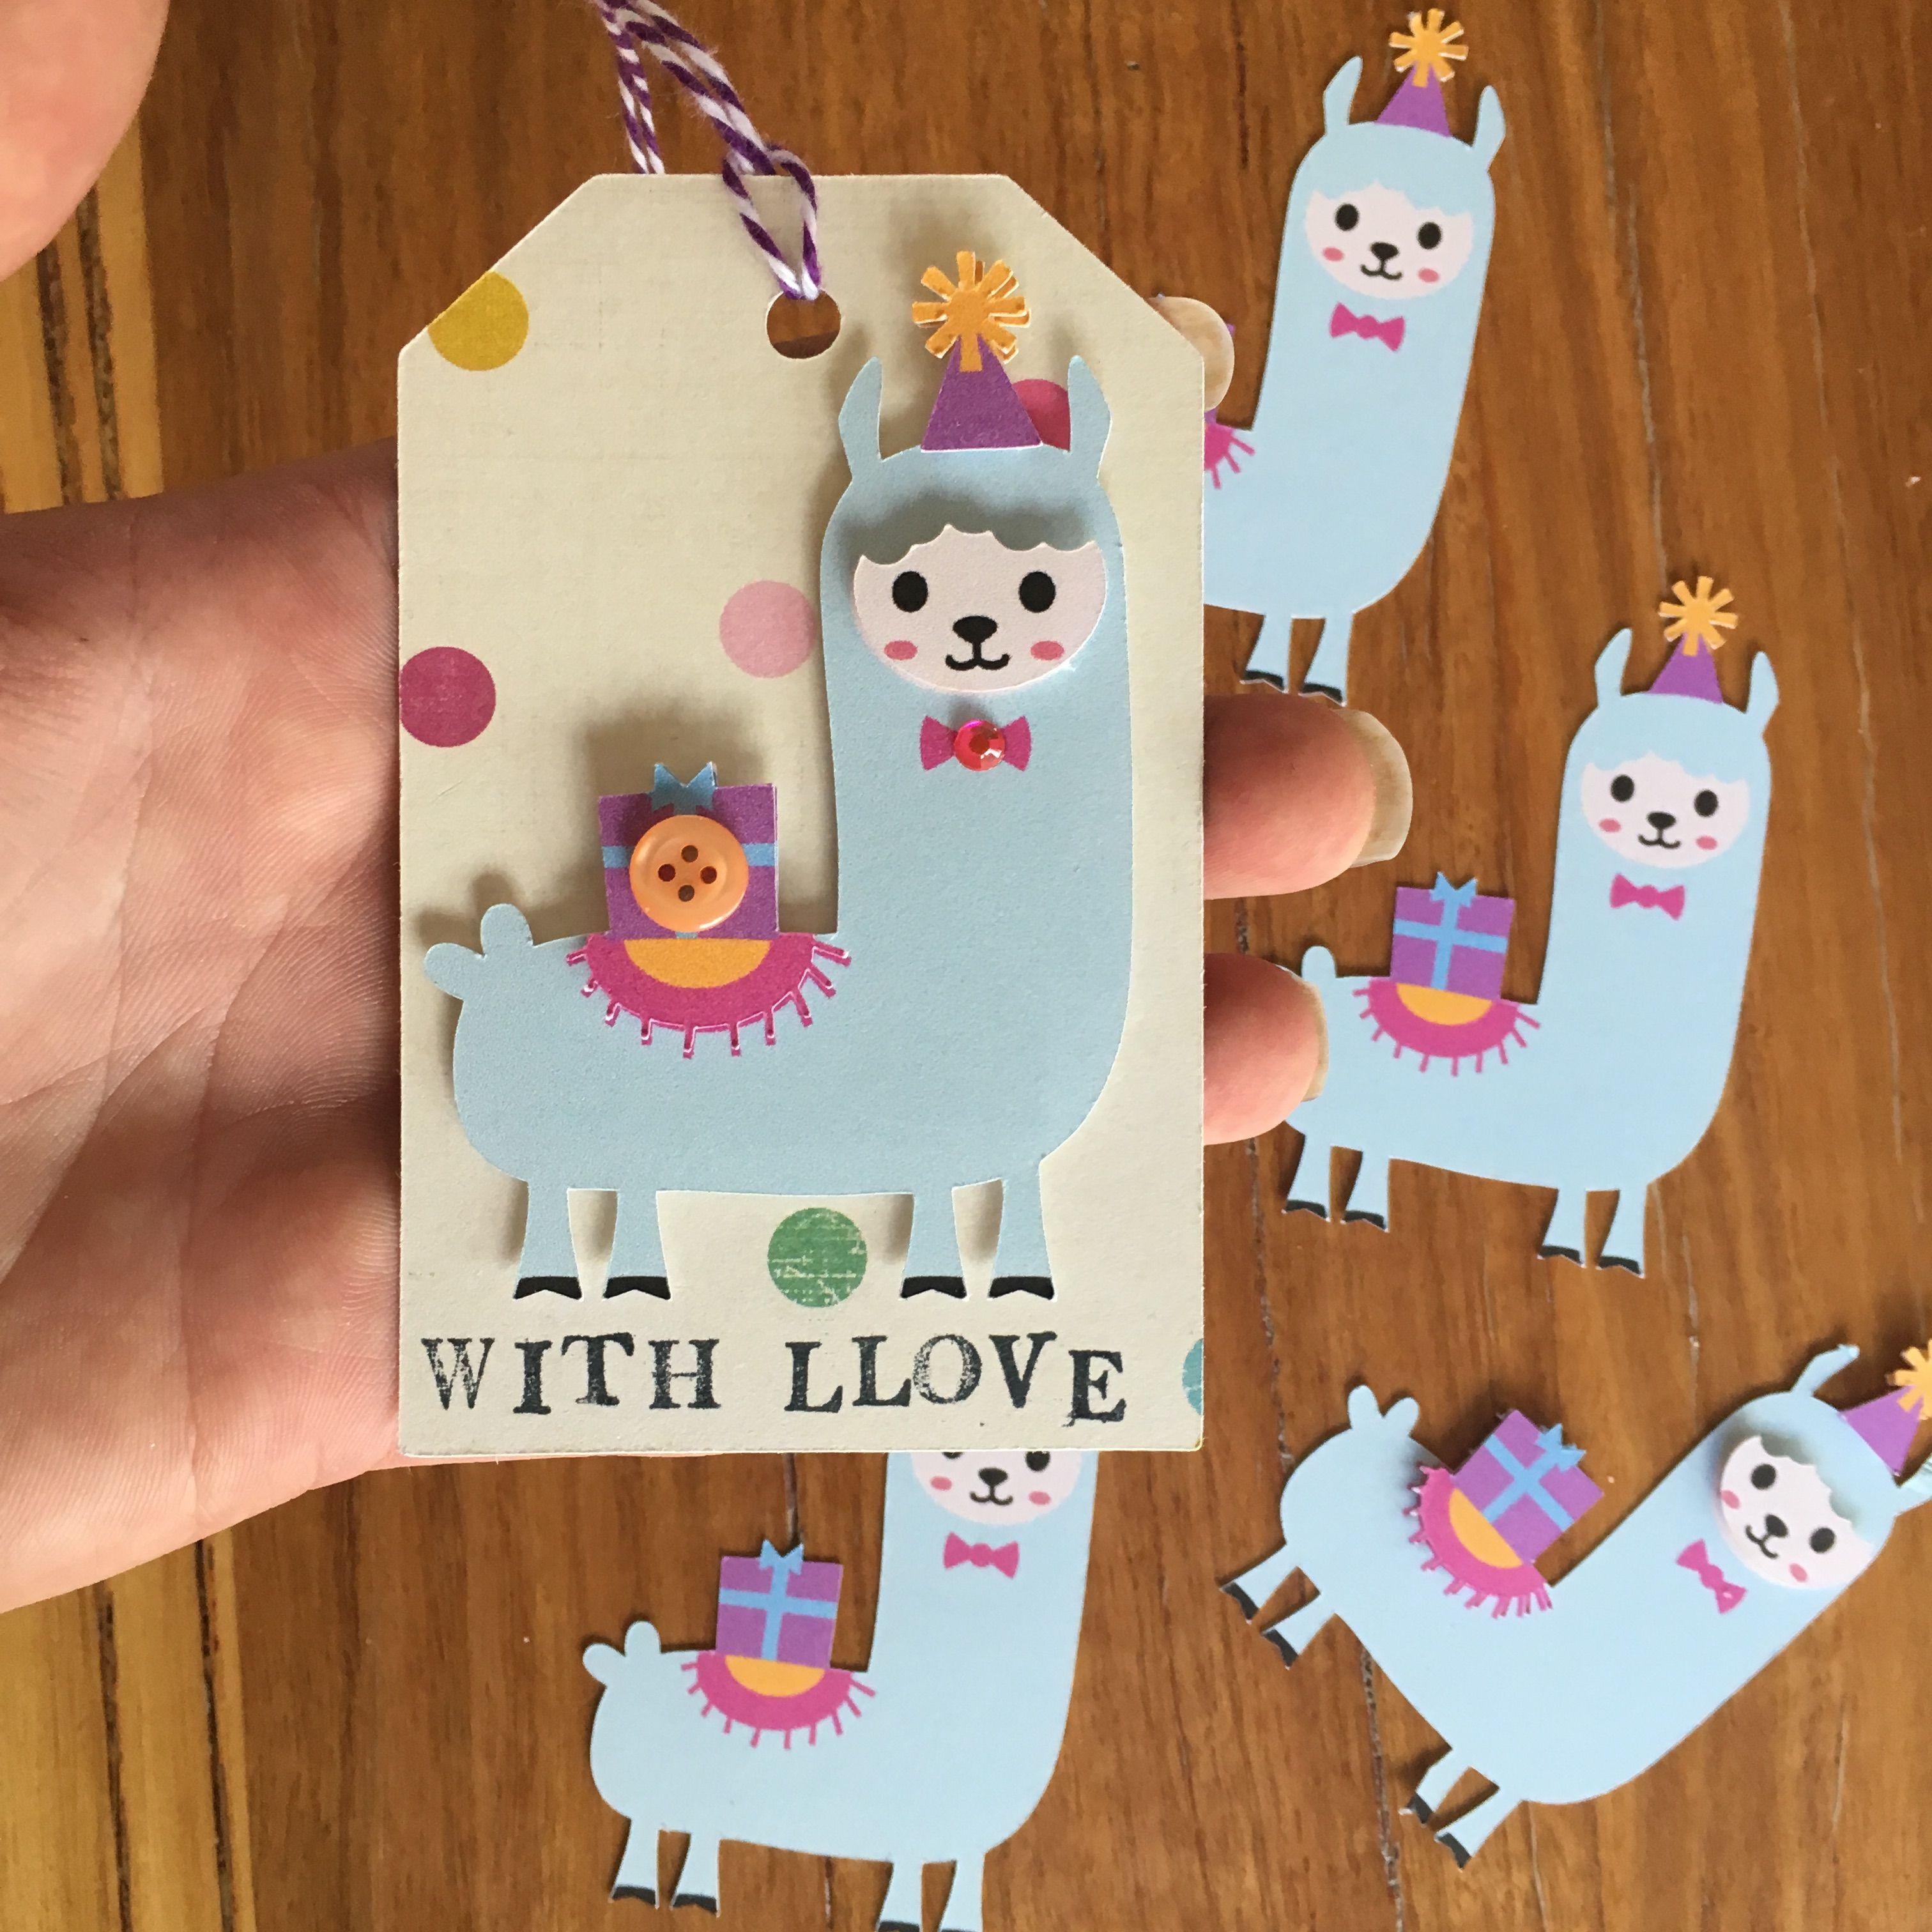 321051b2ddf Llama alpaca gift tag handmade cricut card with llove pun Sanqunetti design  willow fox design svg cutting file print and cut